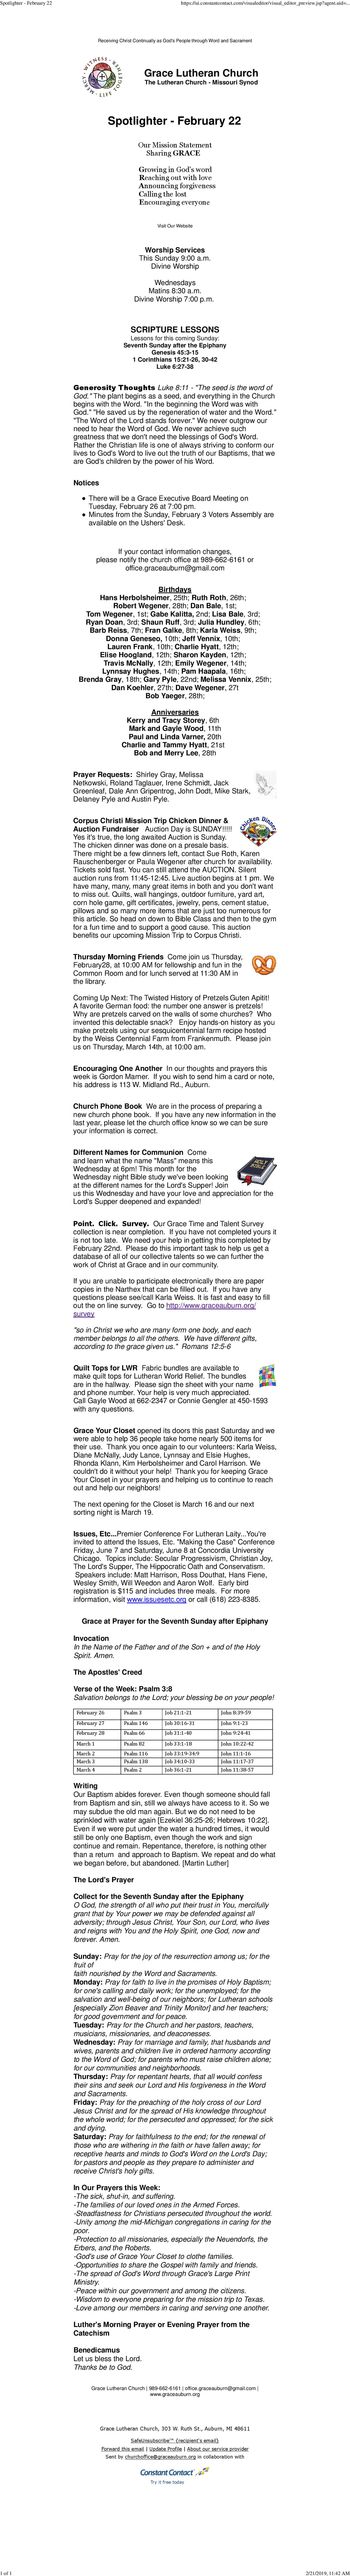 Spotlighter - February 22-page-001.jpg